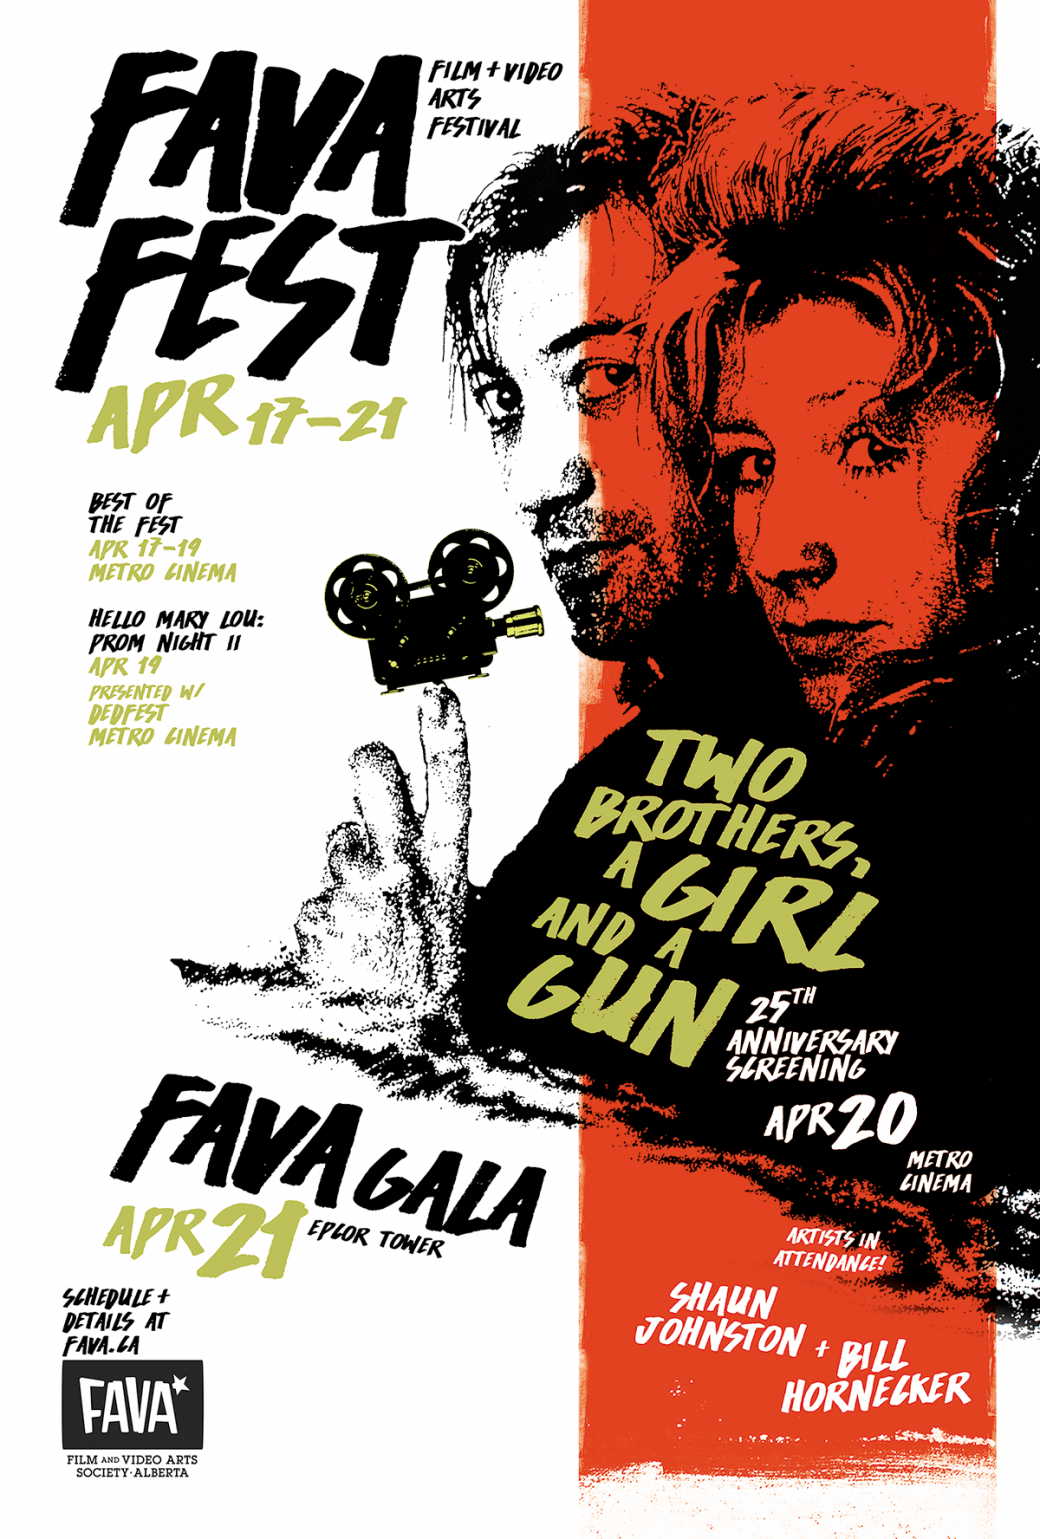 FAVA FEST: Film and Video Arts Festival